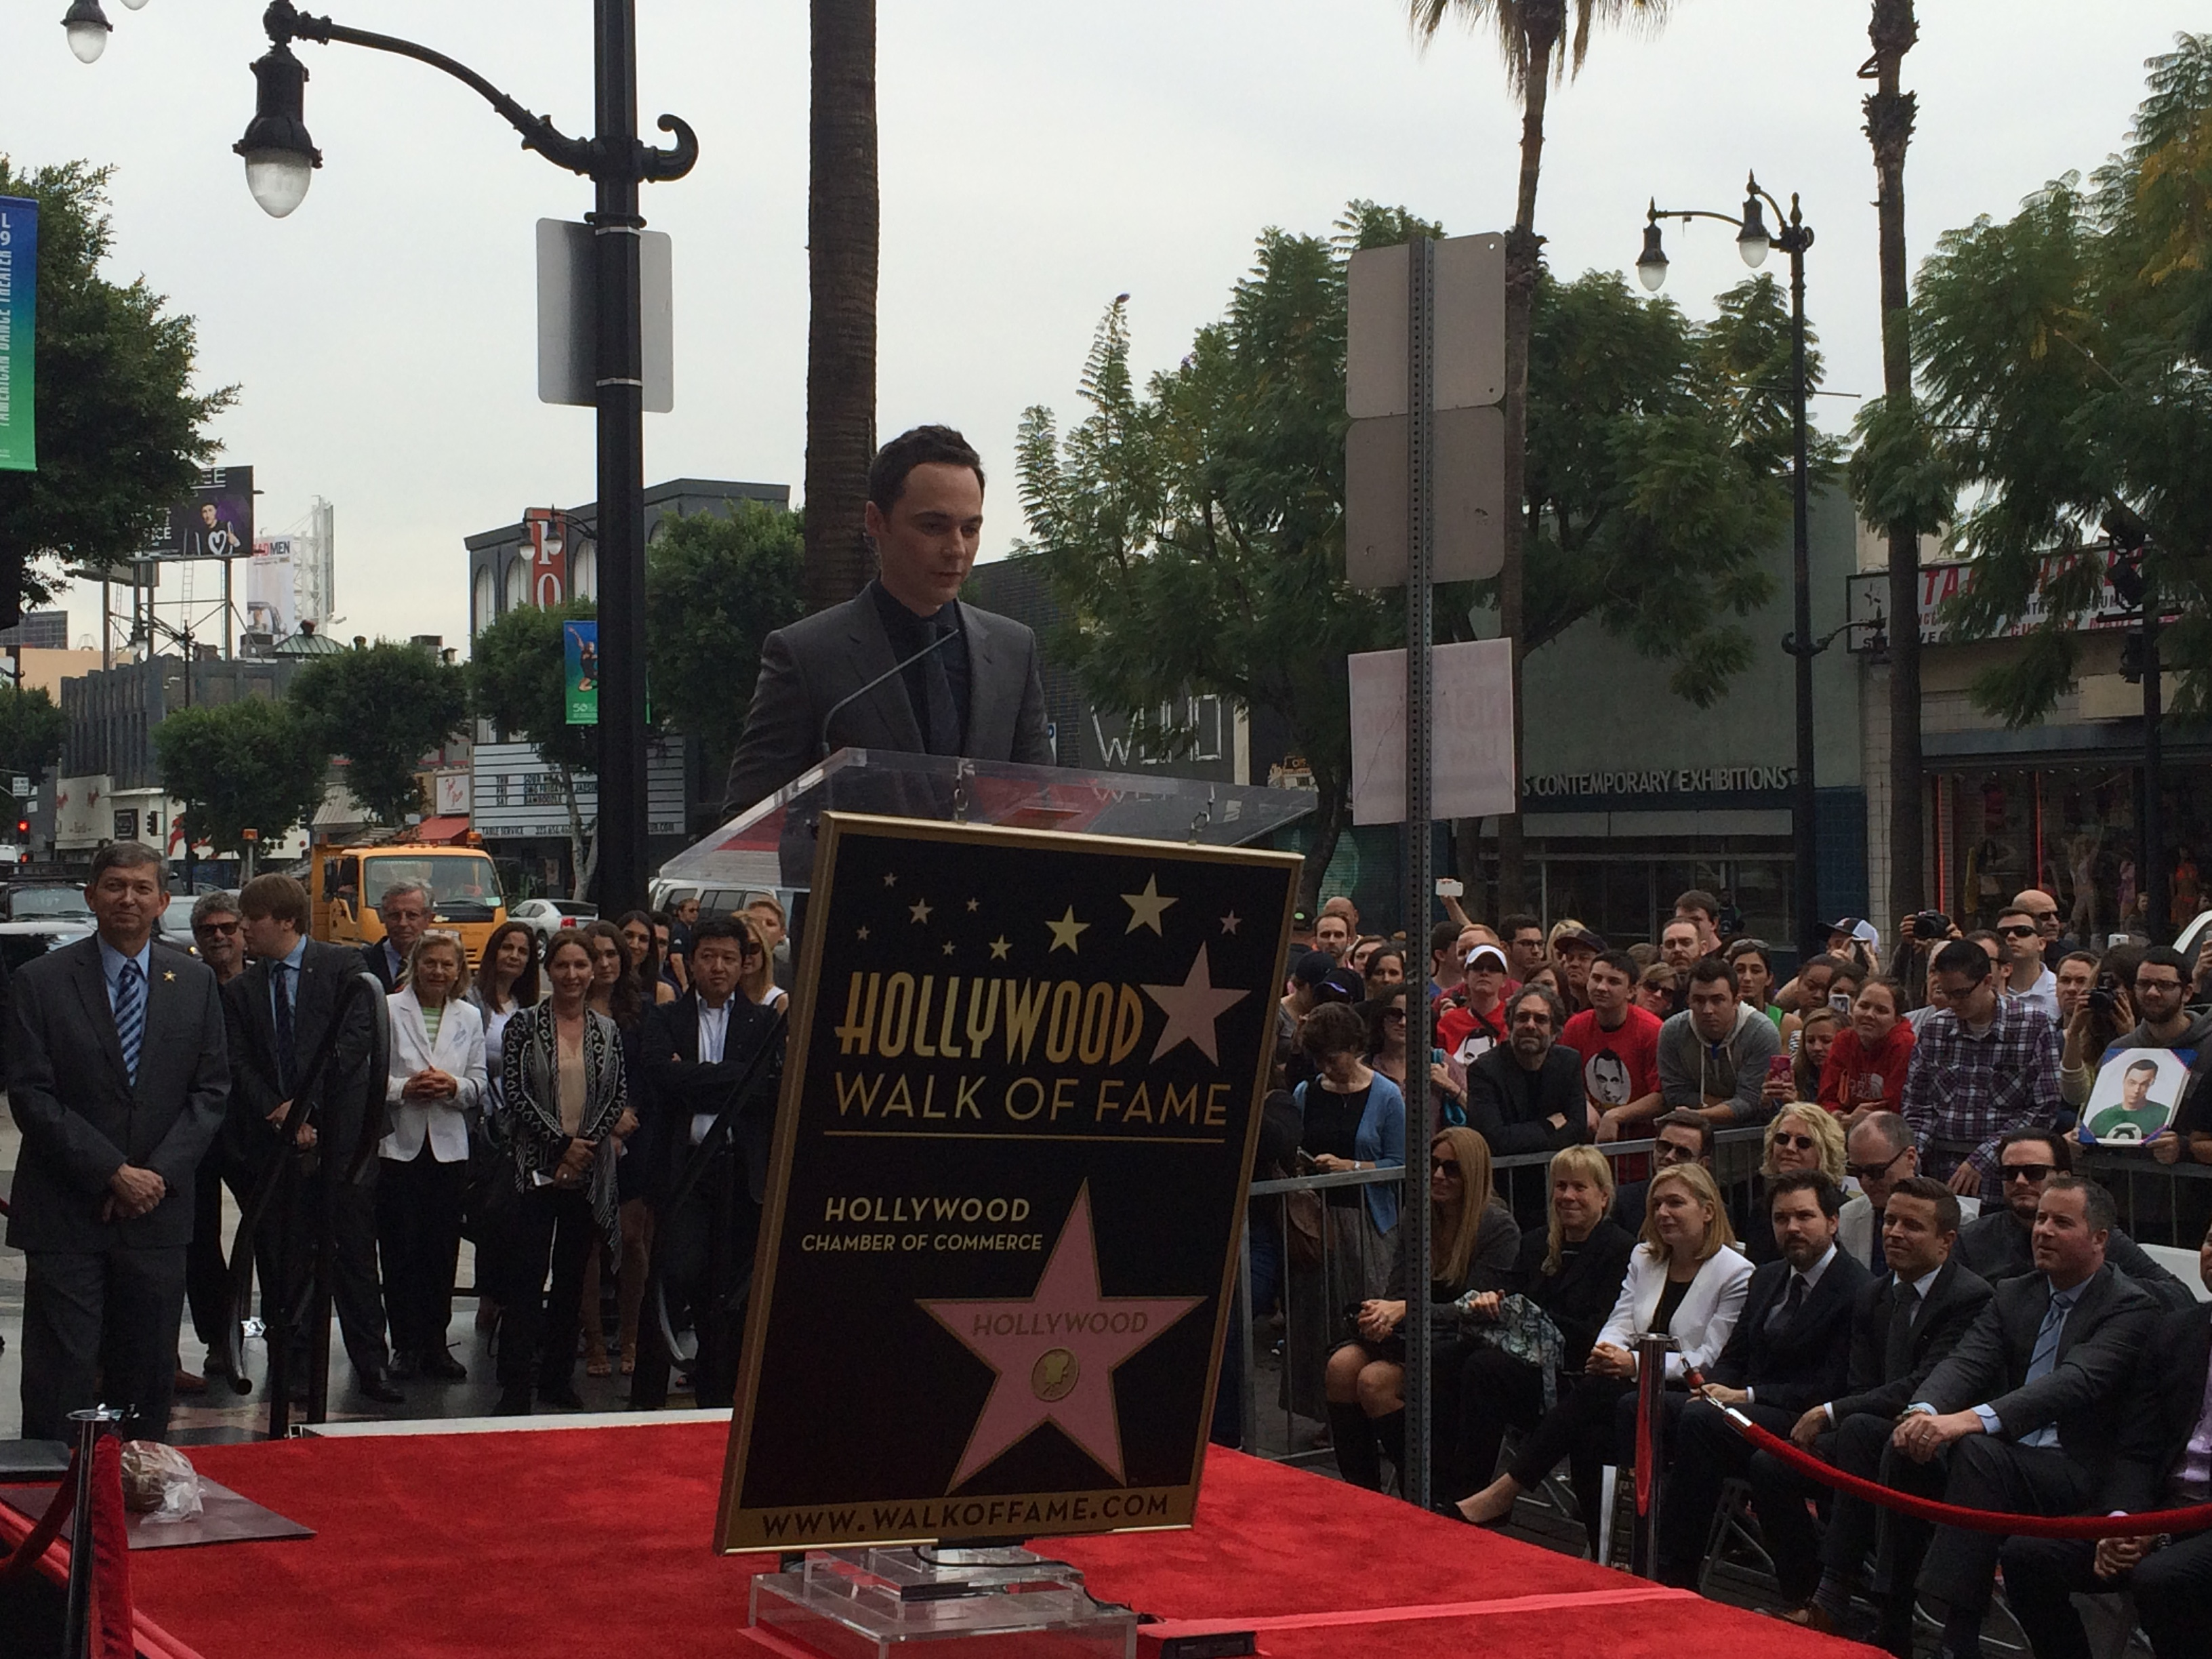 Jim at the podium